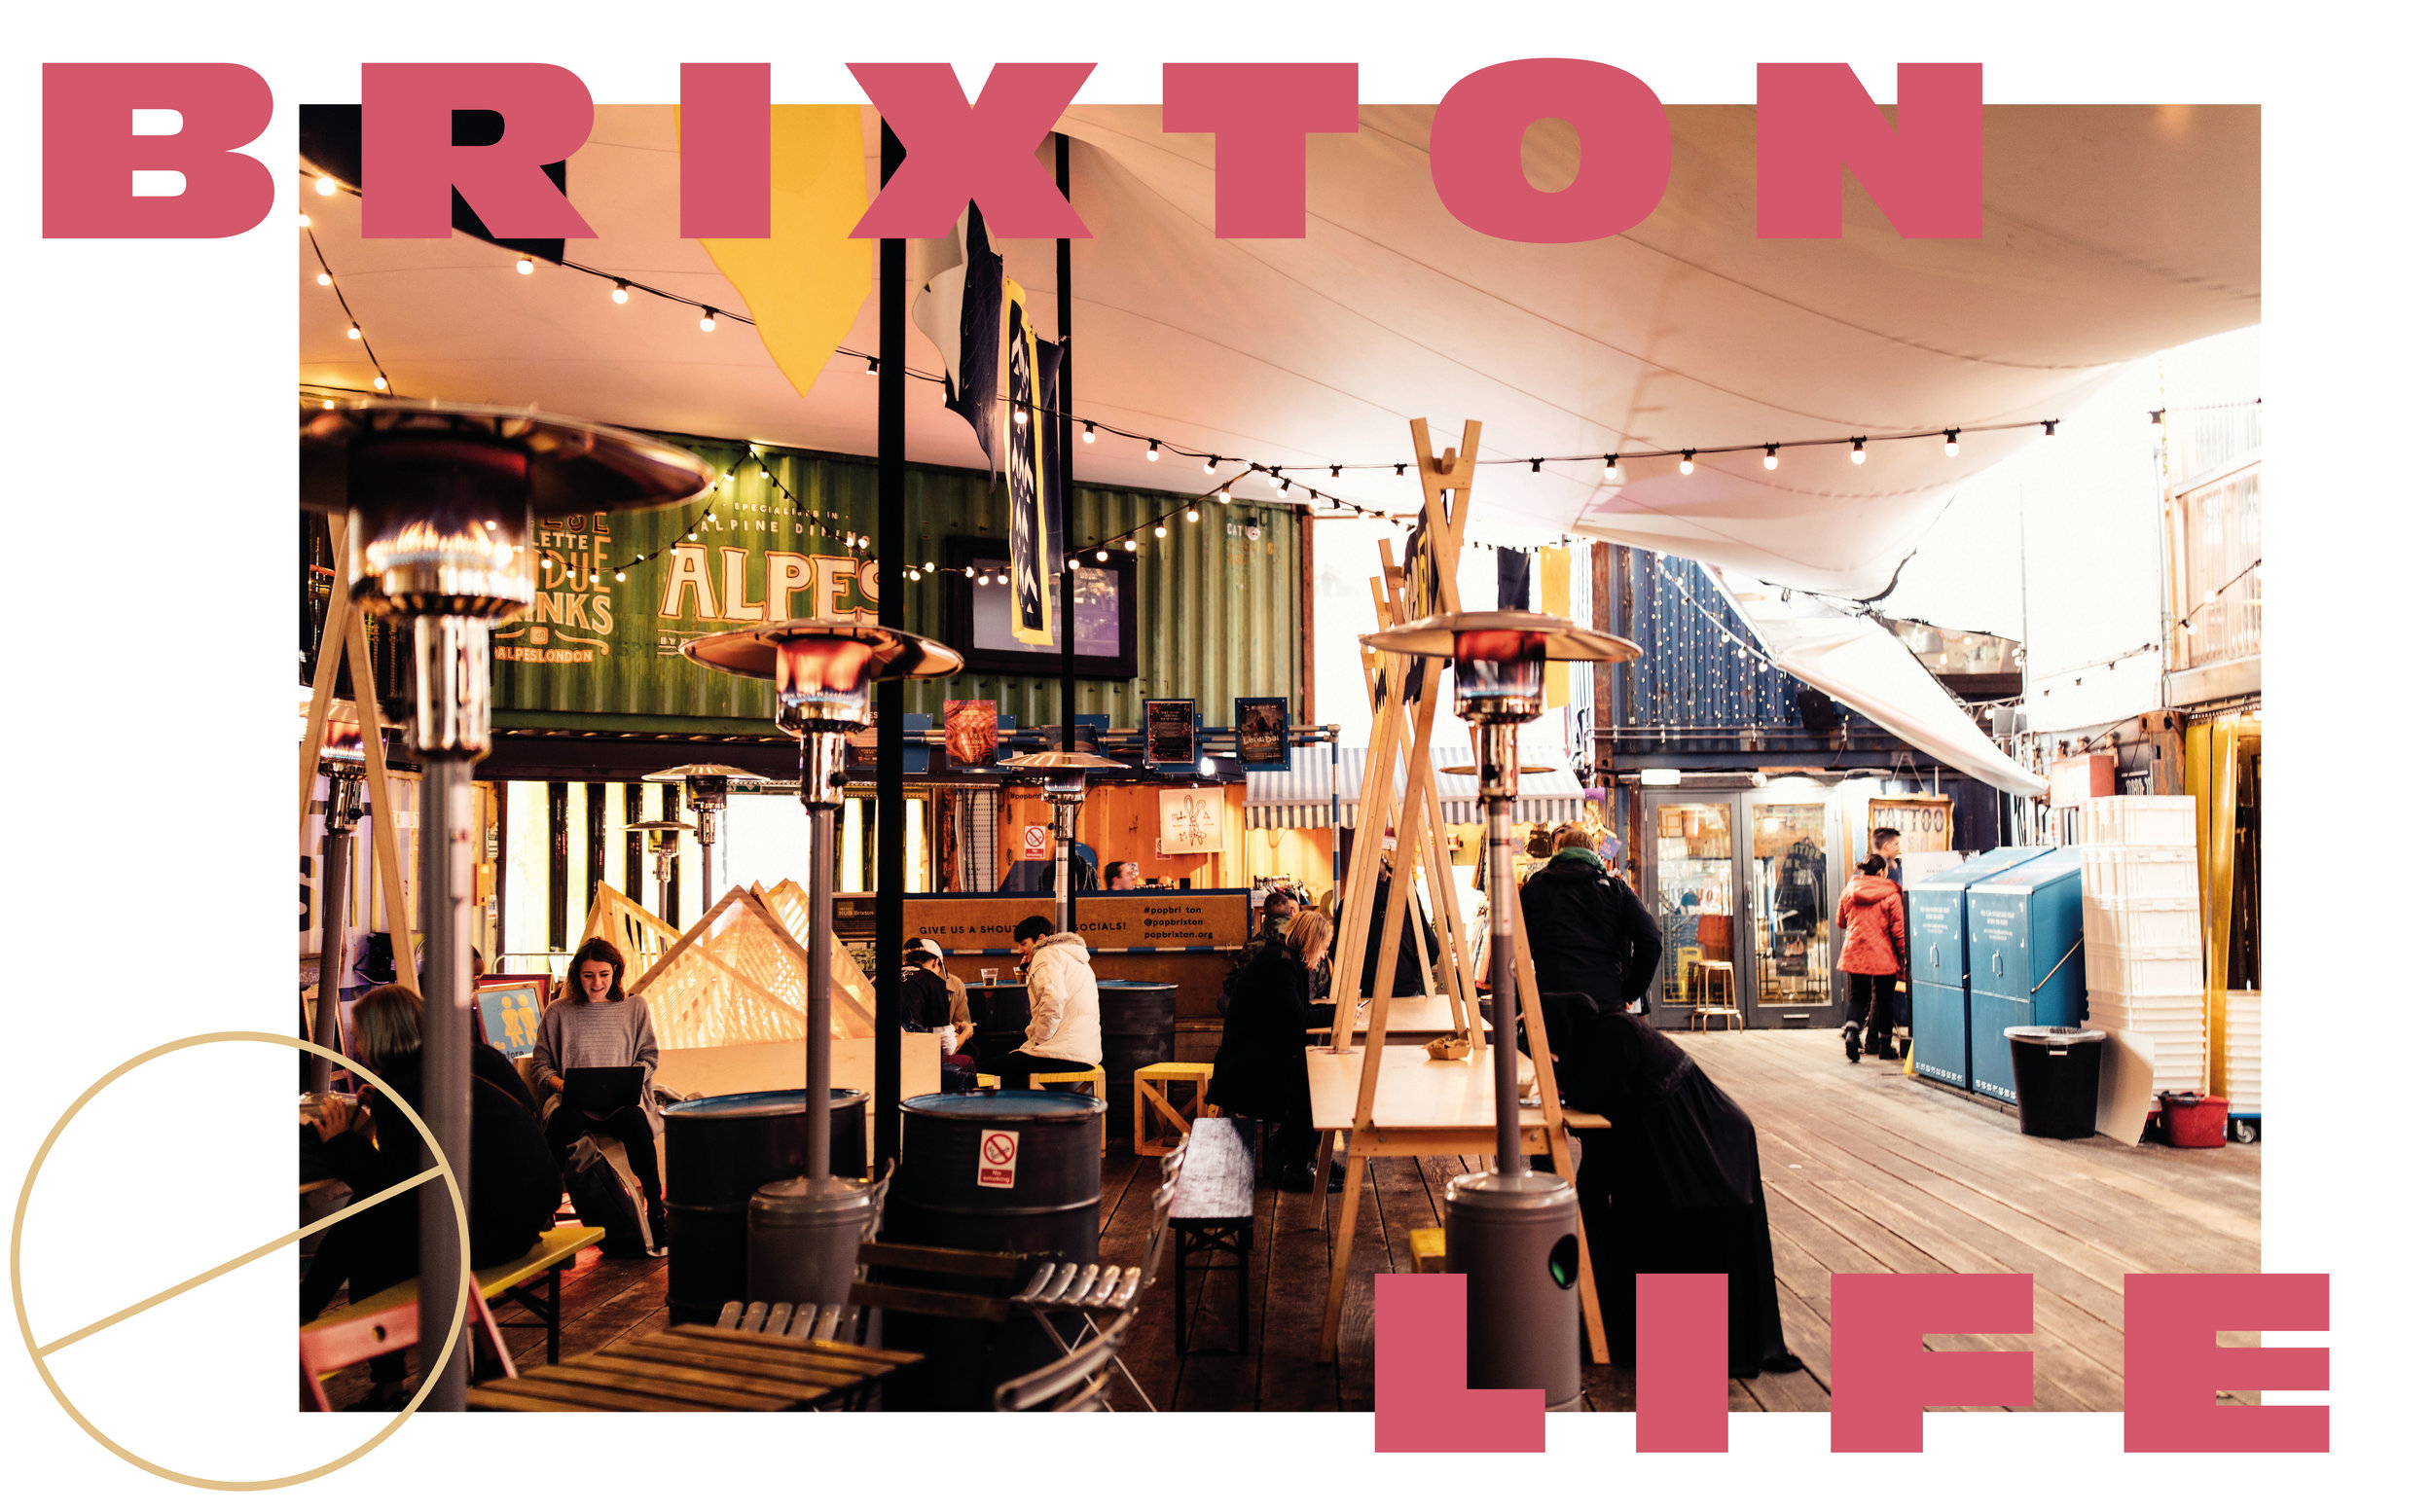 Depot_Brixton life.jpg